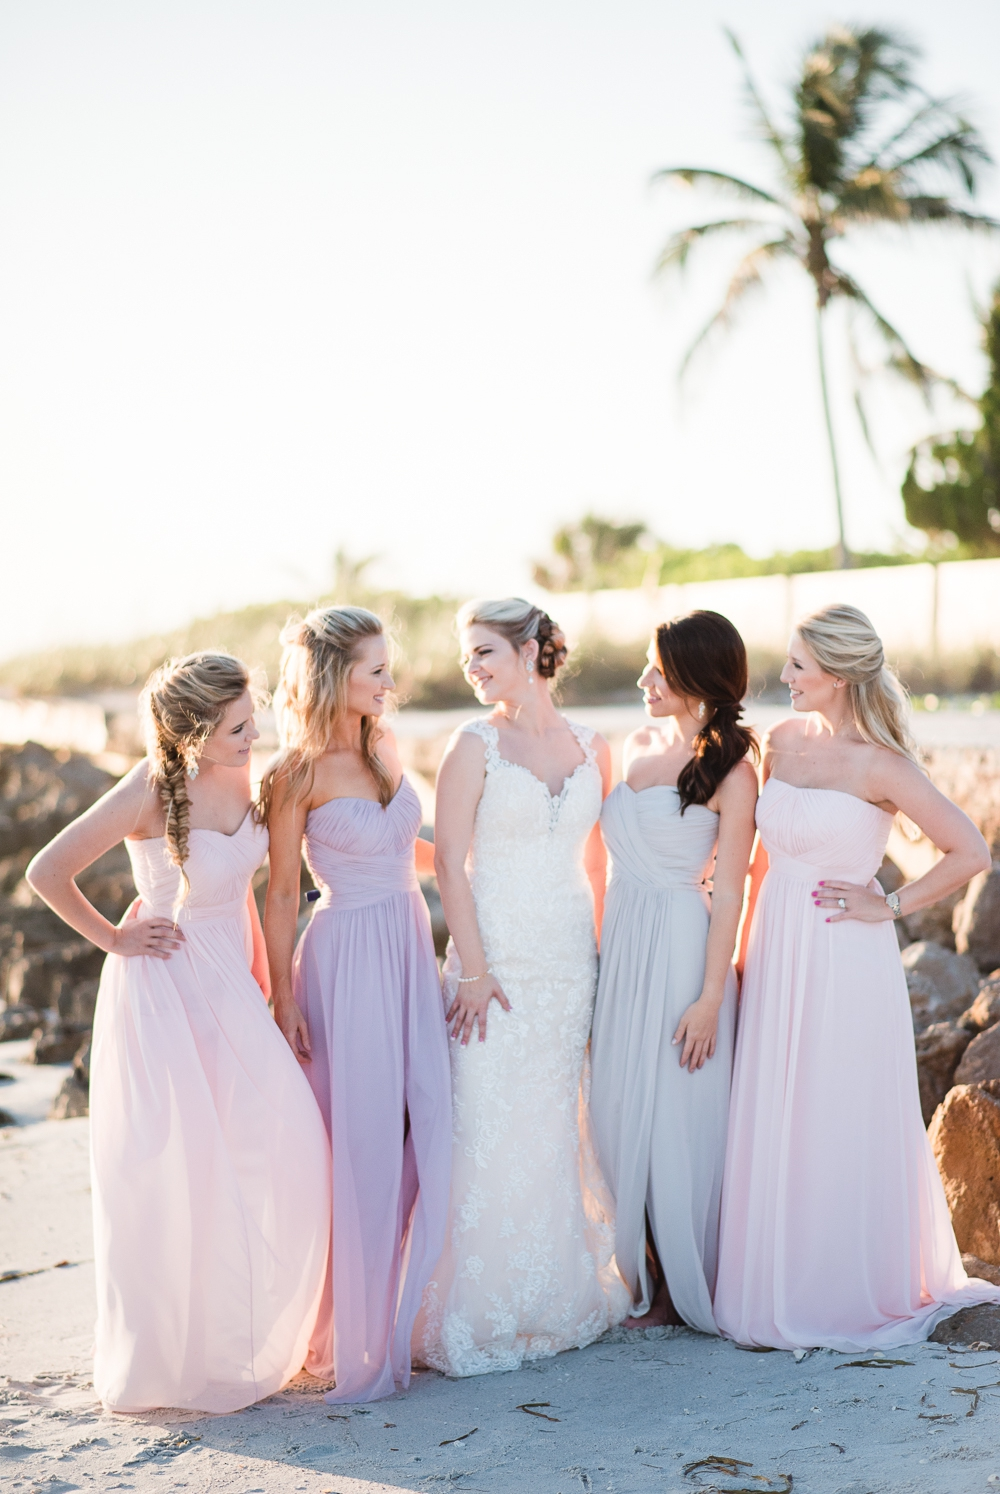 2016 HLM Wedding Beach Shoot 12.jpg